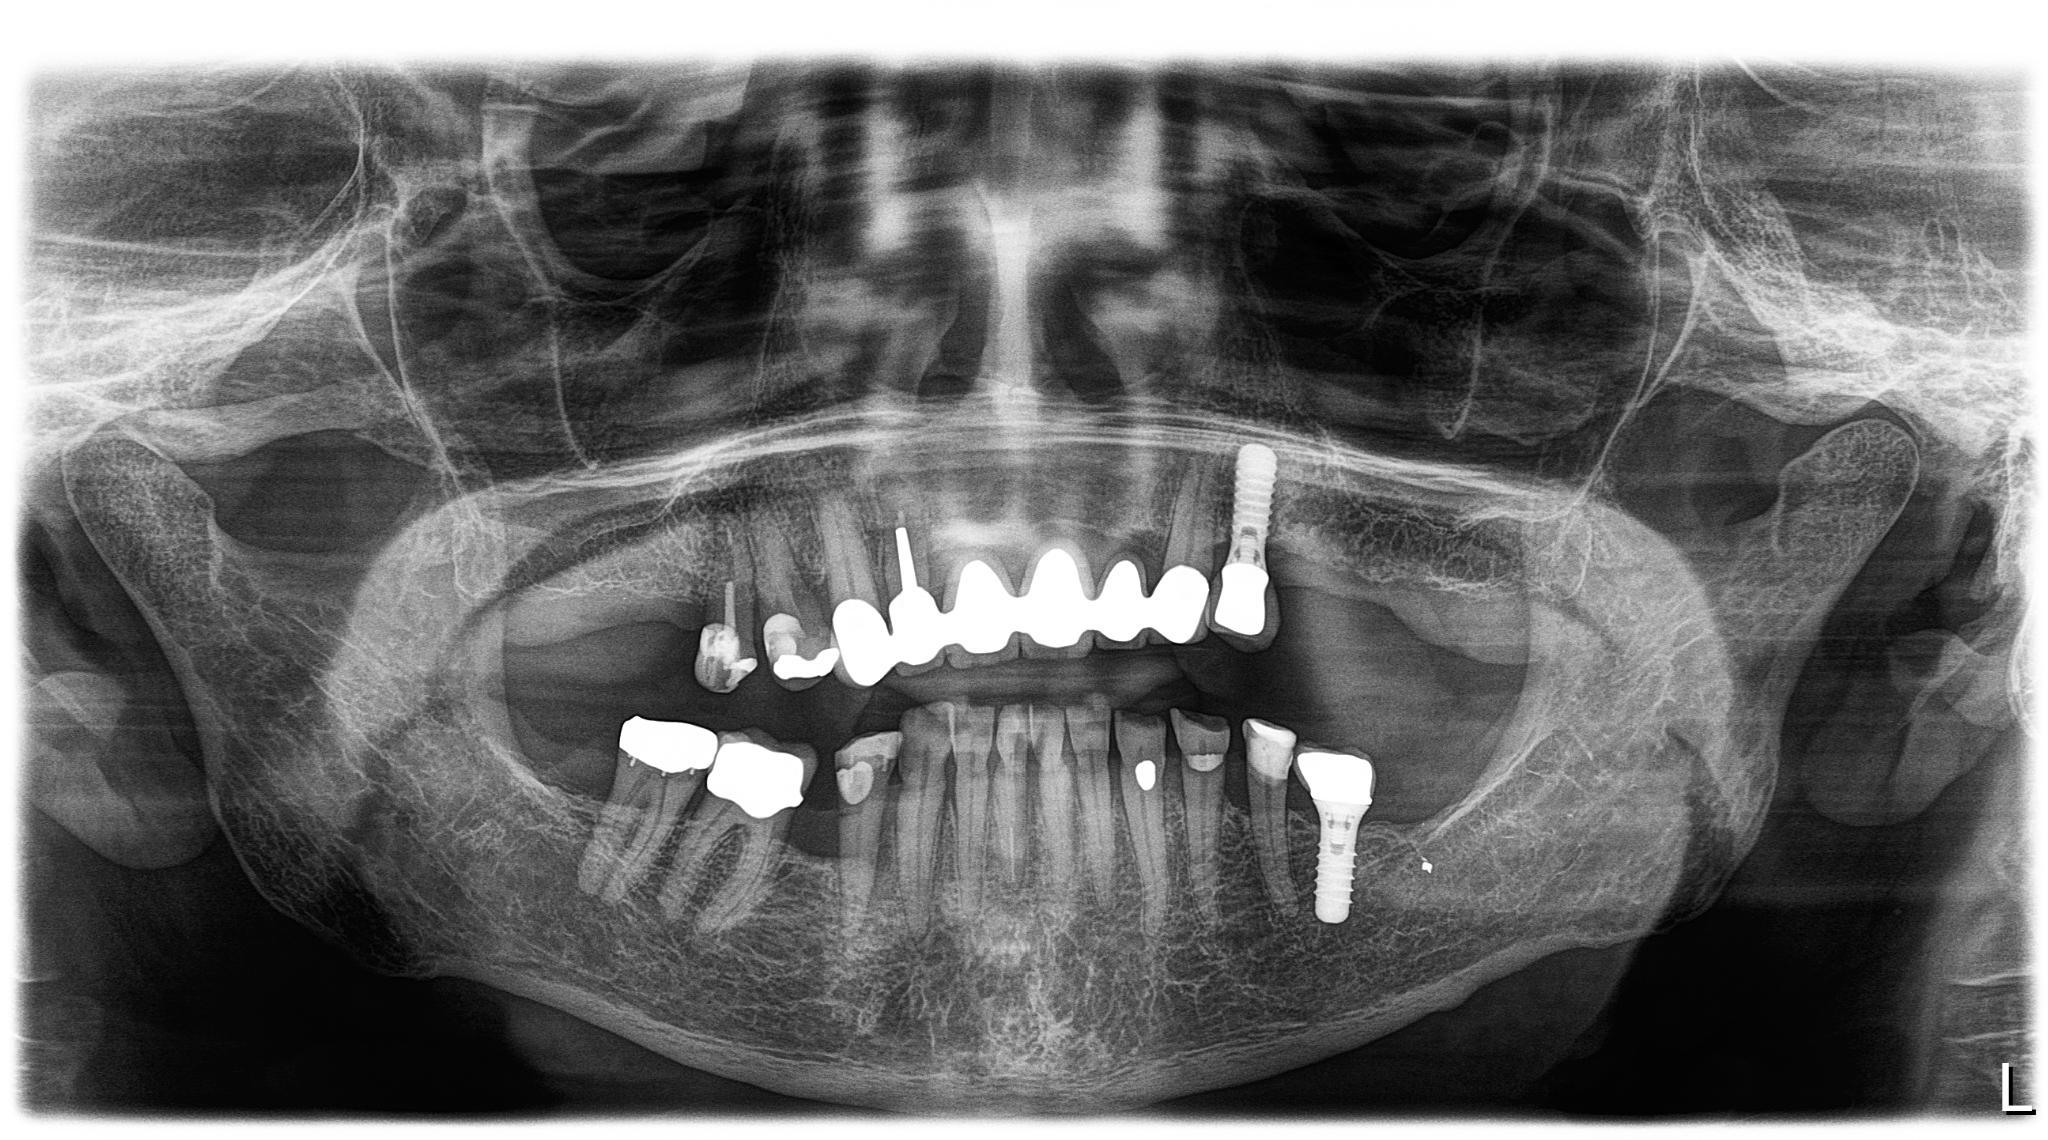 Orthophos SL 3D